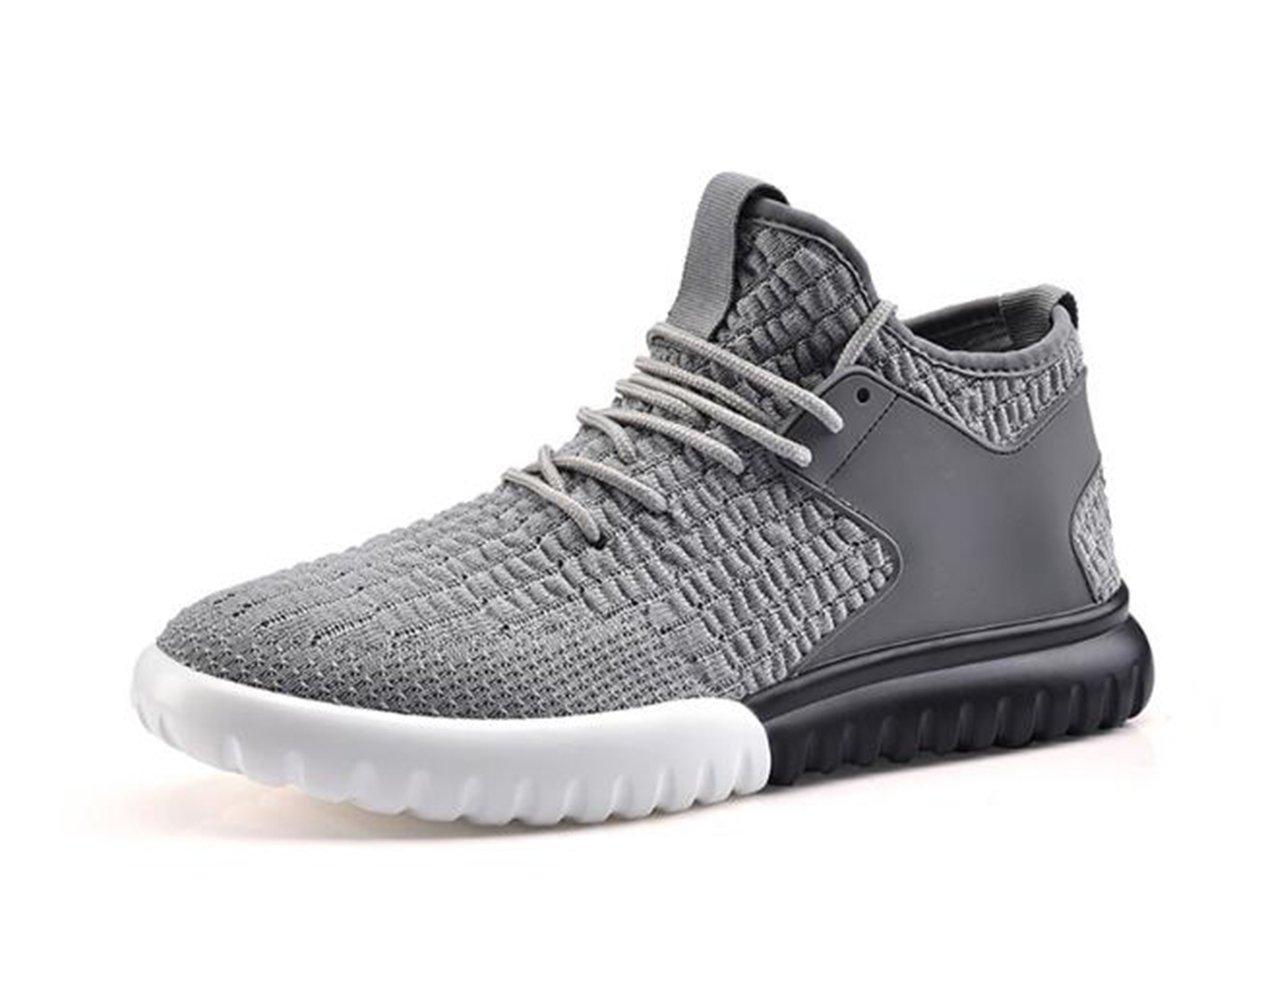 LFEU Plataforma Hombre 41 EU|gris Venta de calzado deportivo de moda en línea